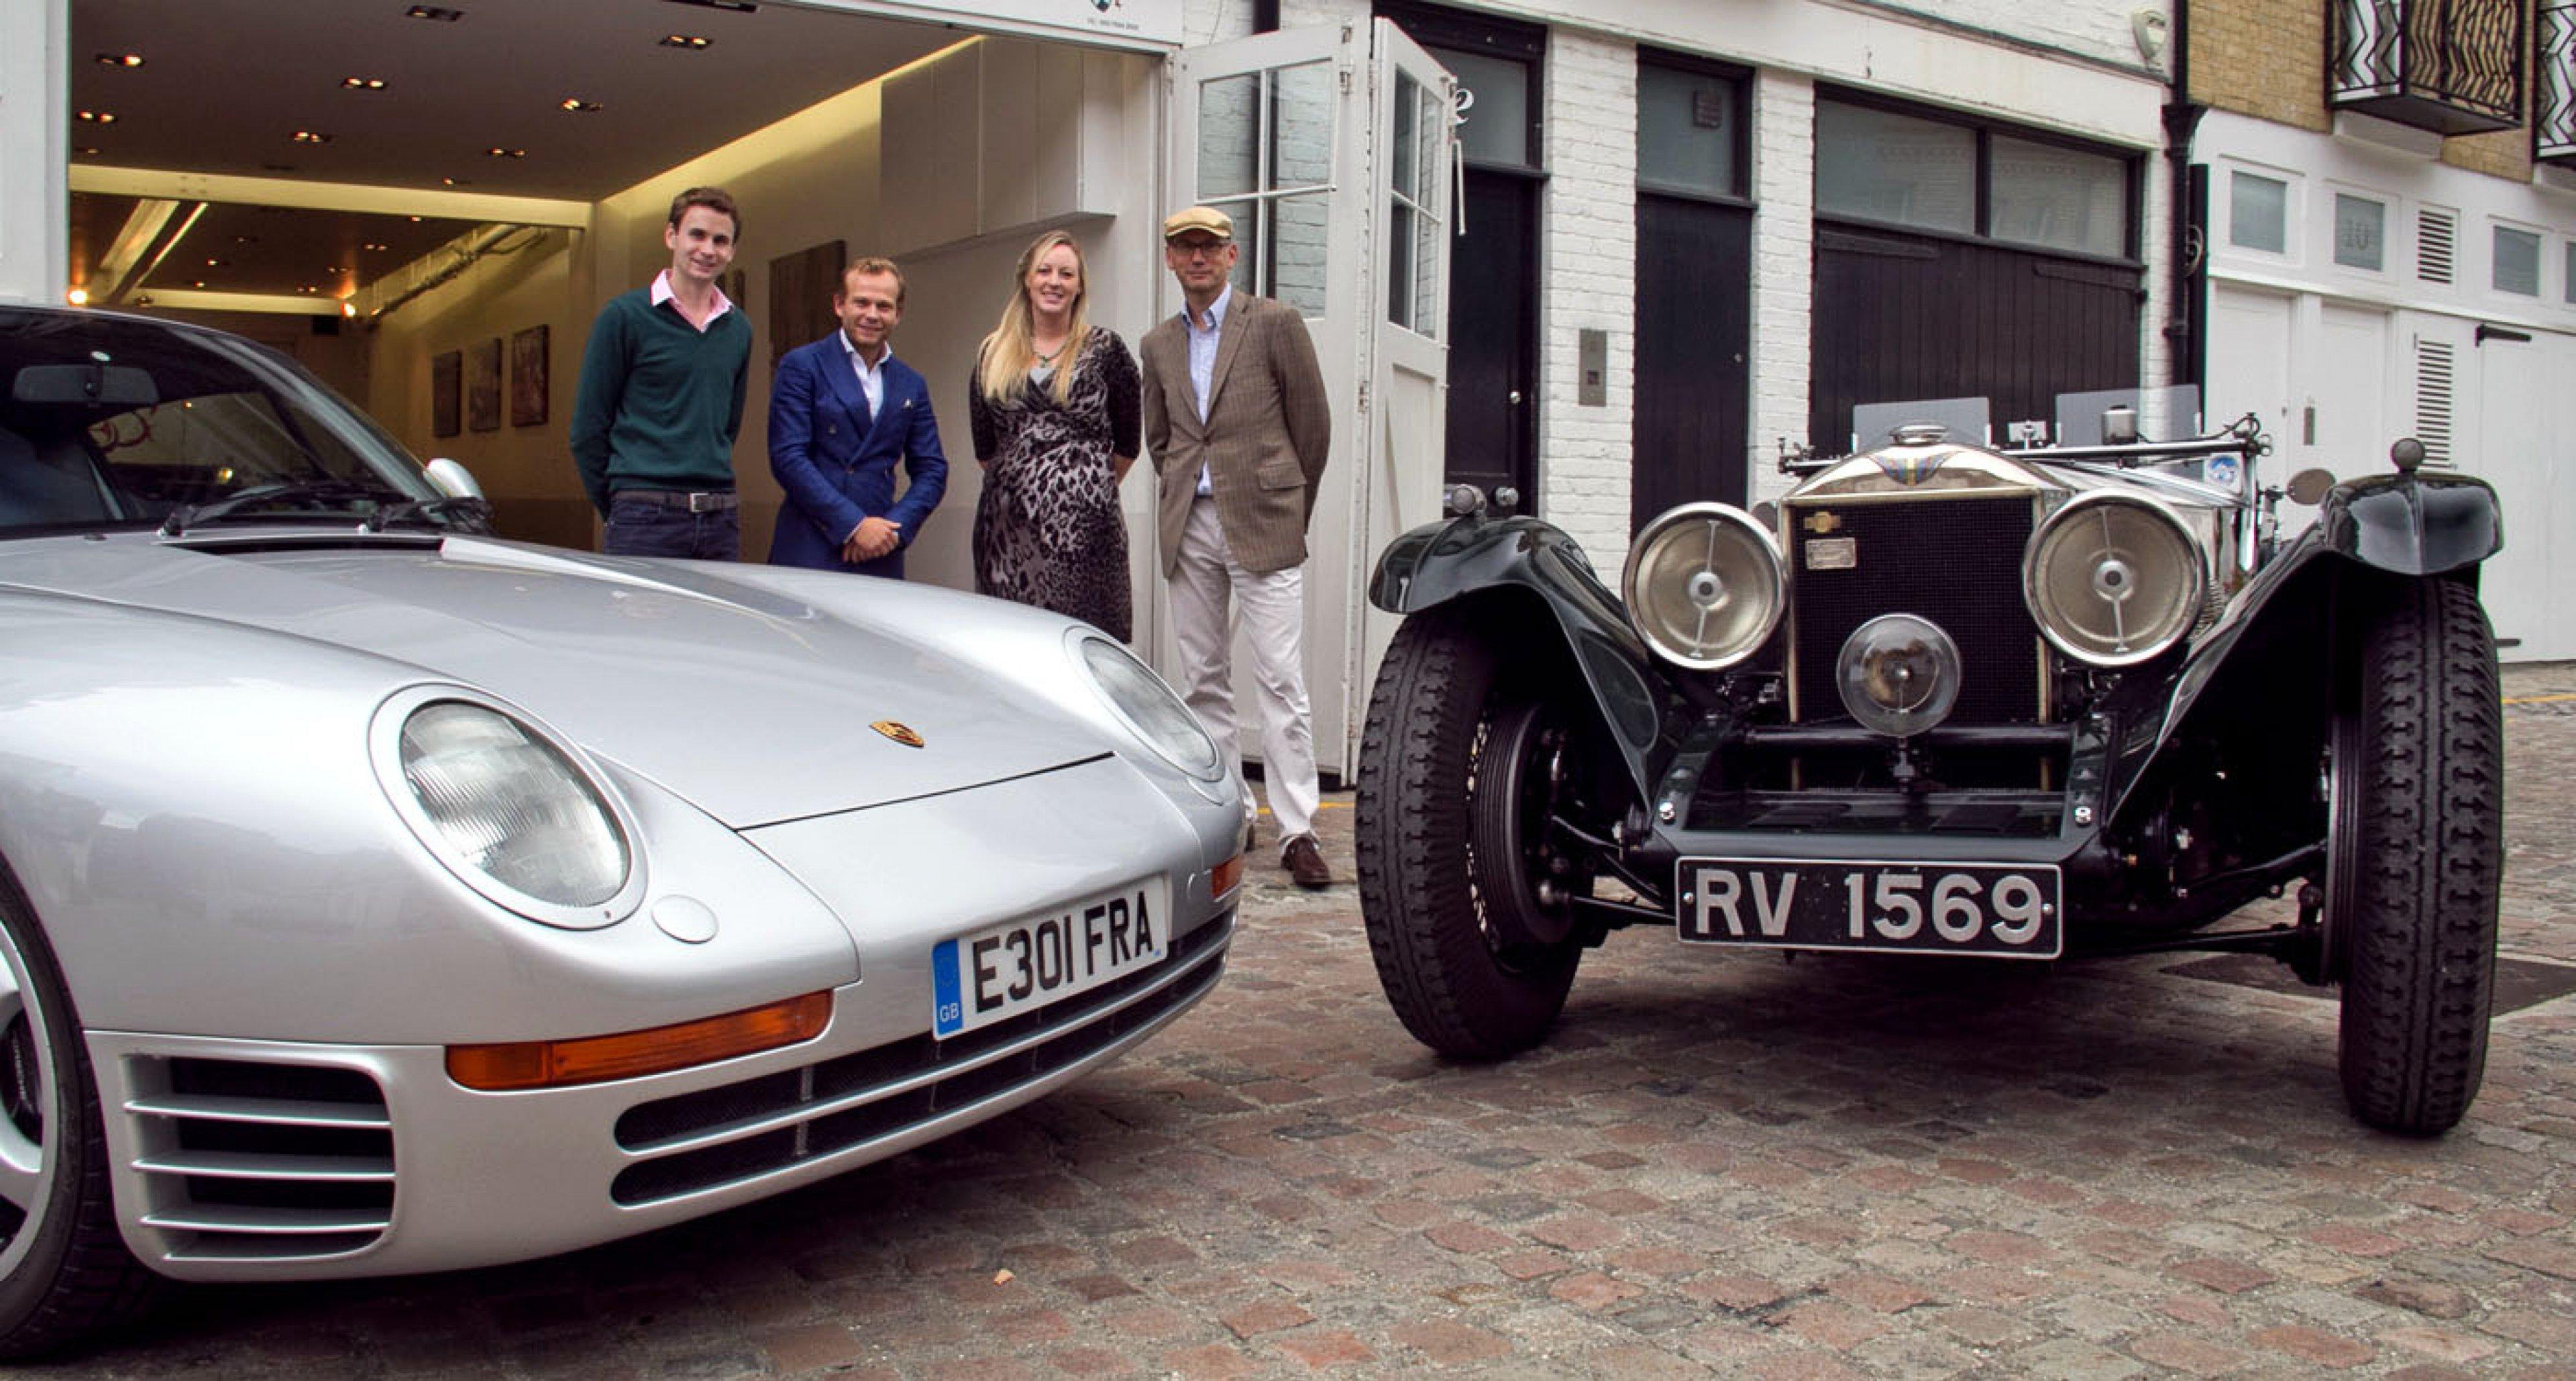 The Fiskens Team (L-R): Rory Henderson, Dylan Miles, Sophie Dawes and Gregor Fisken